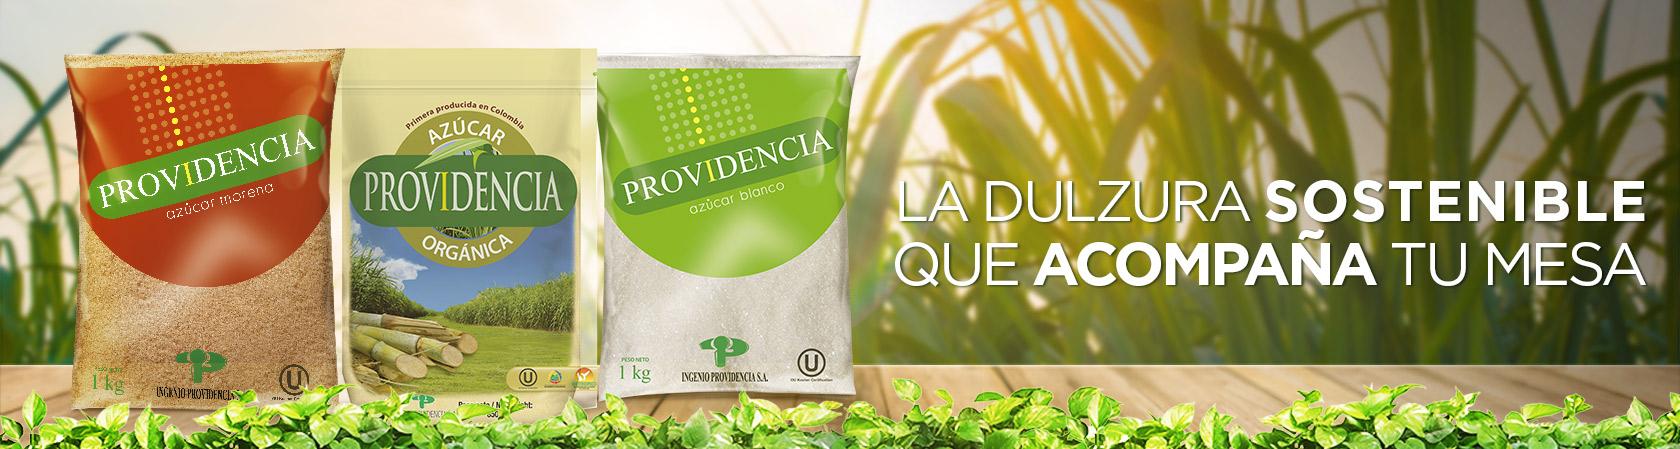 Providencia references